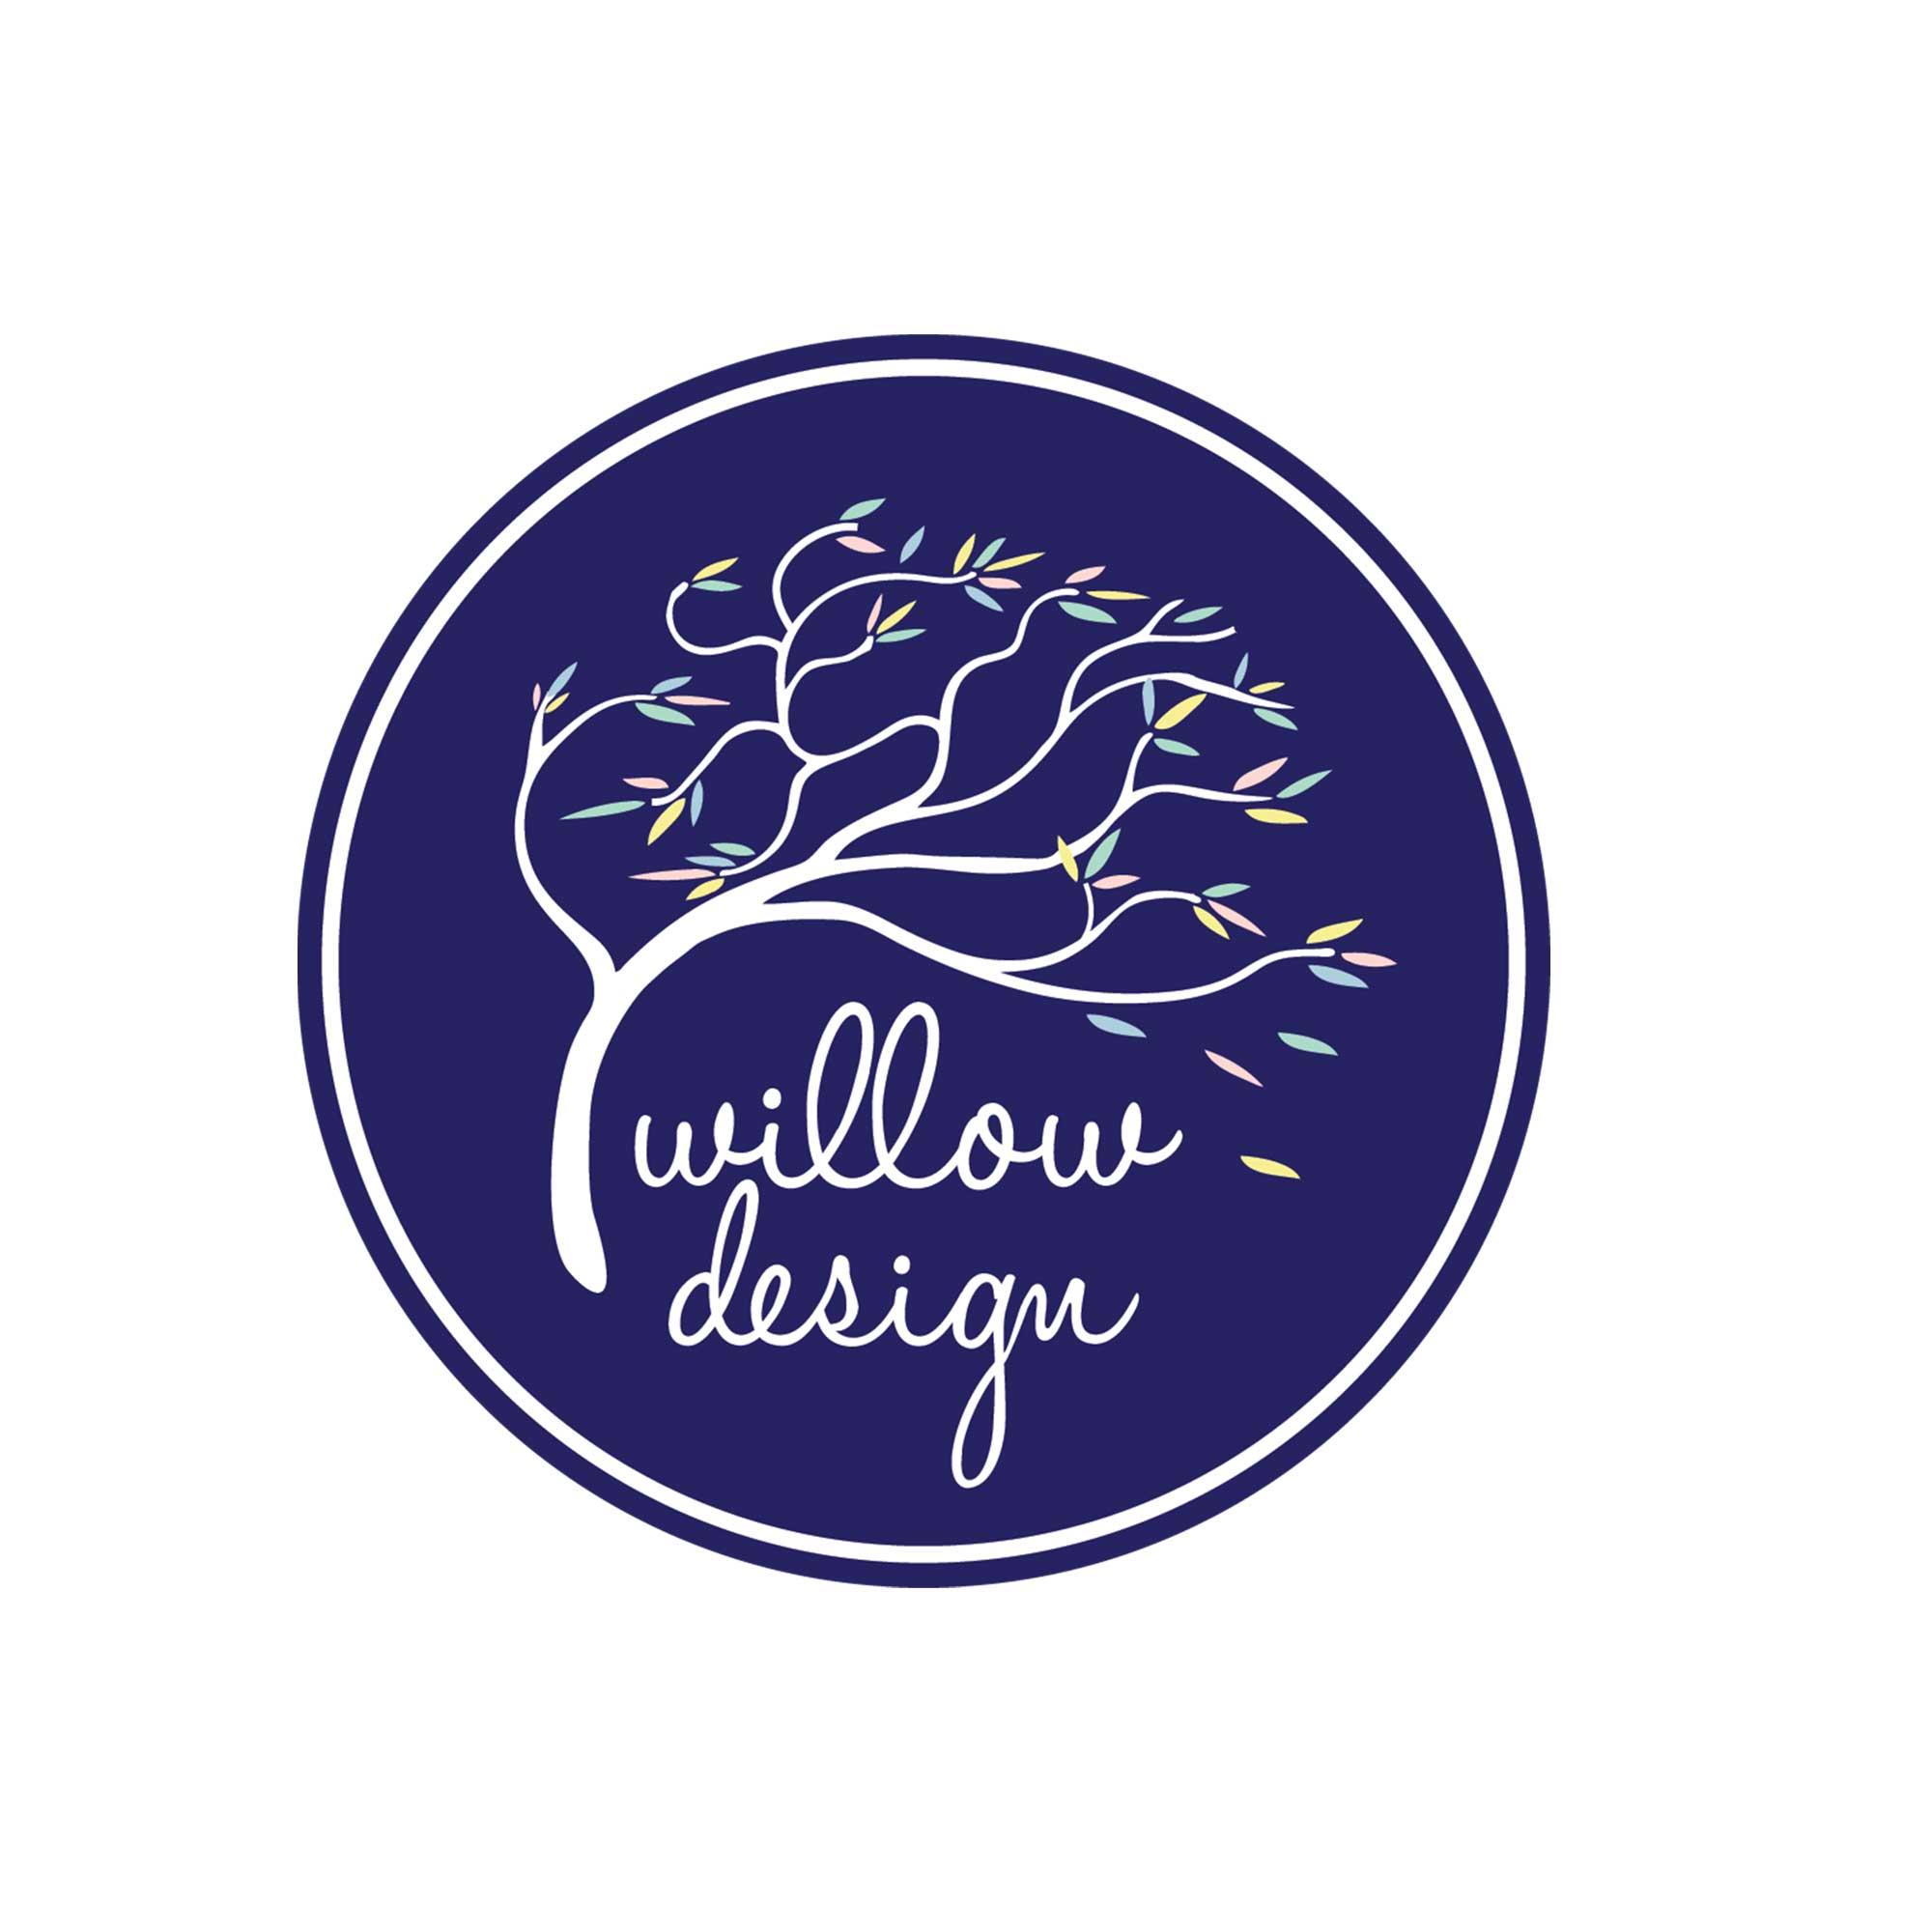 willow-2.jpg